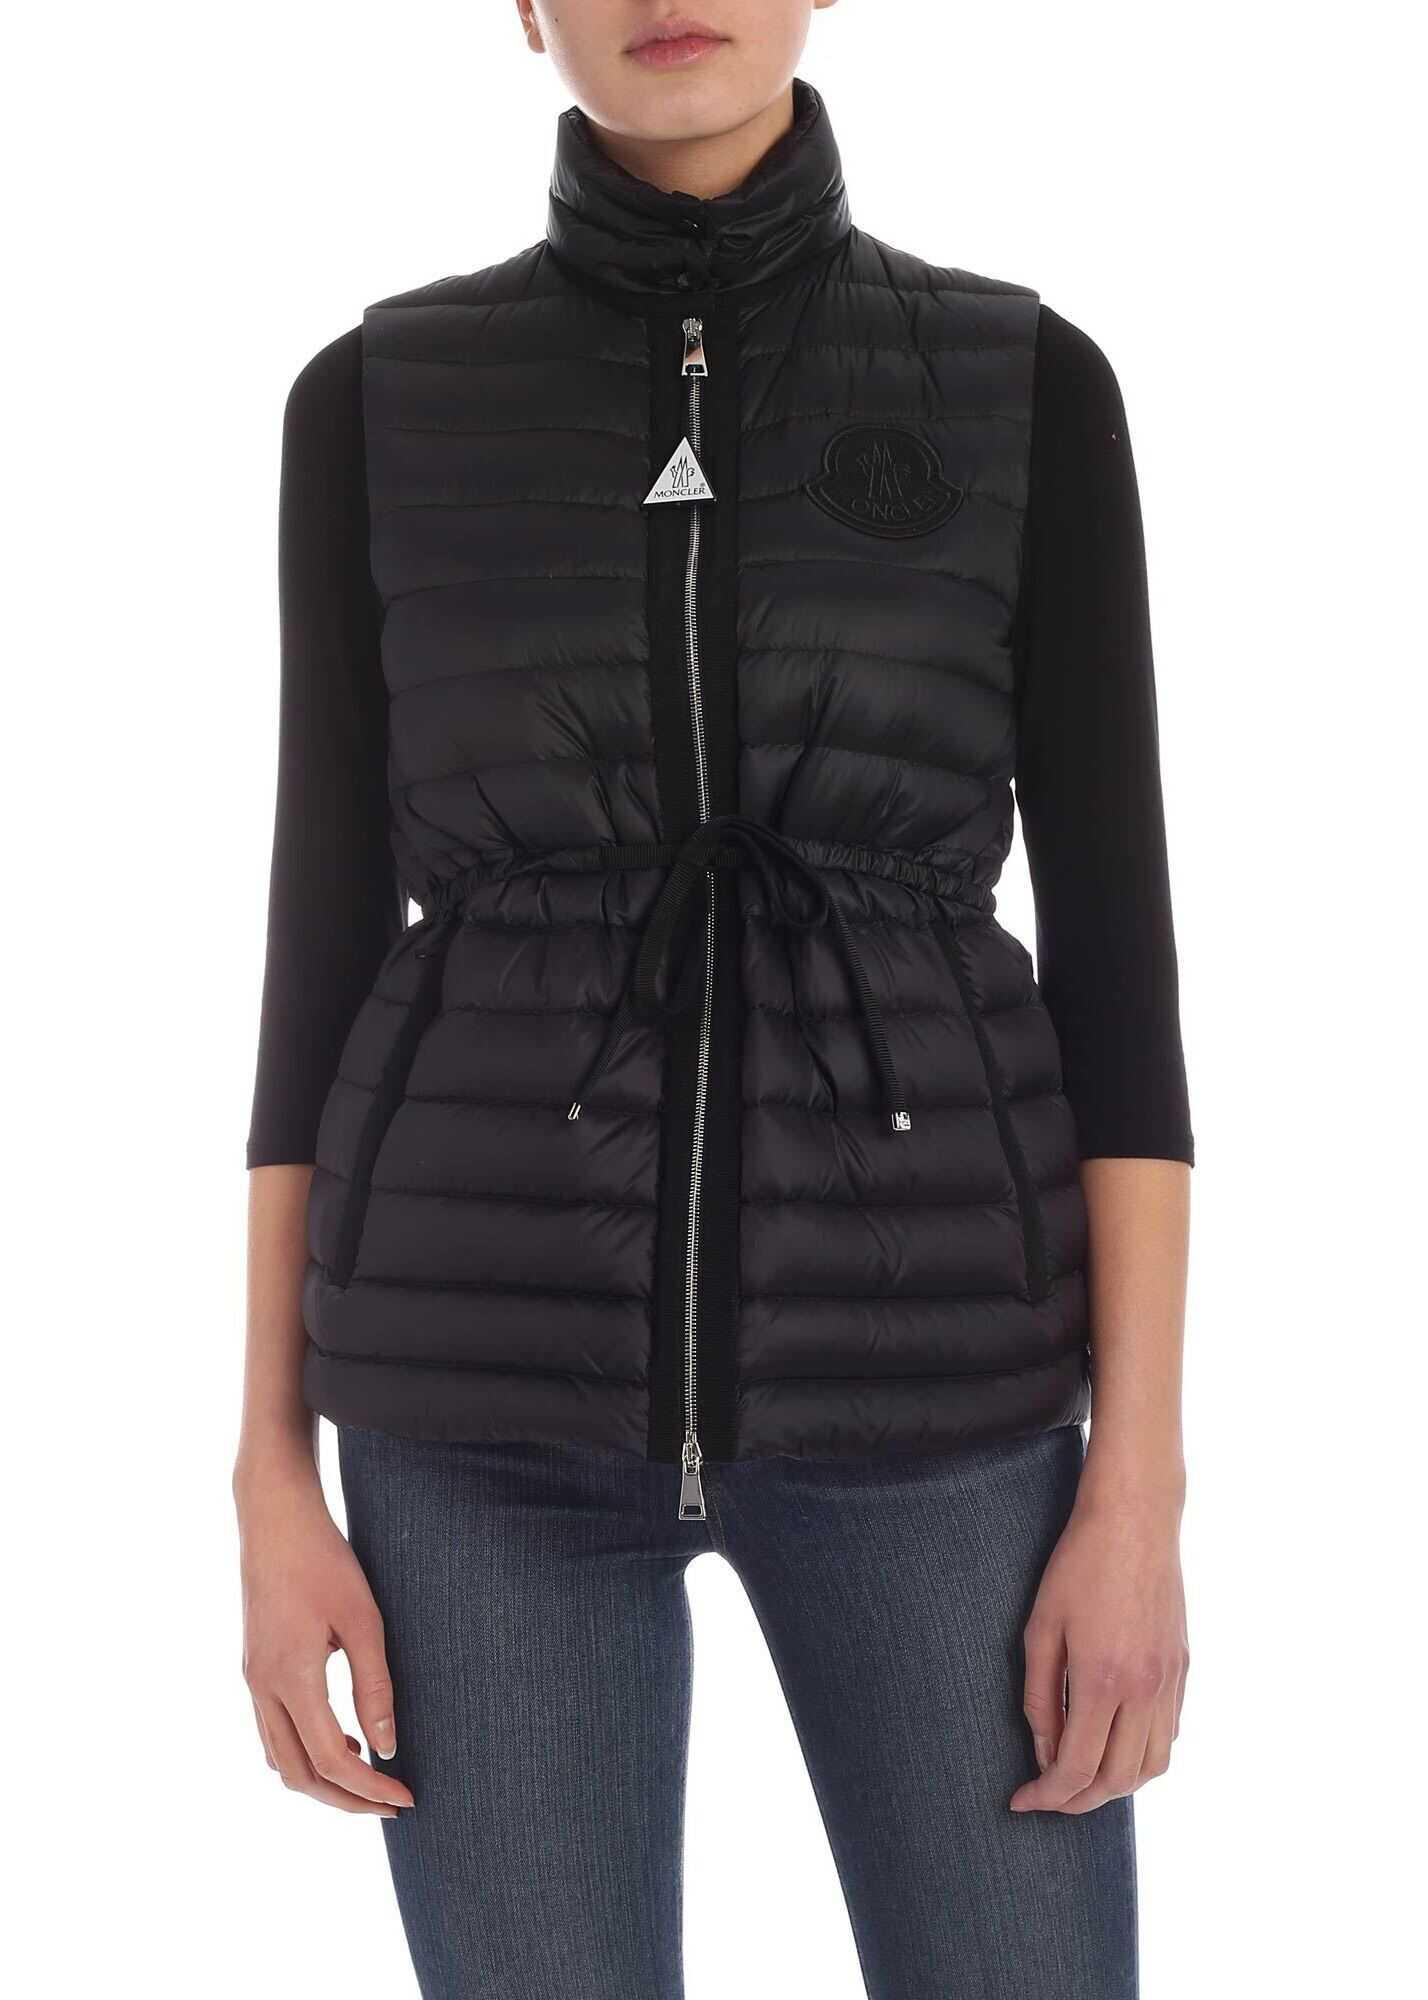 Azur Waistcoat In Black thumbnail